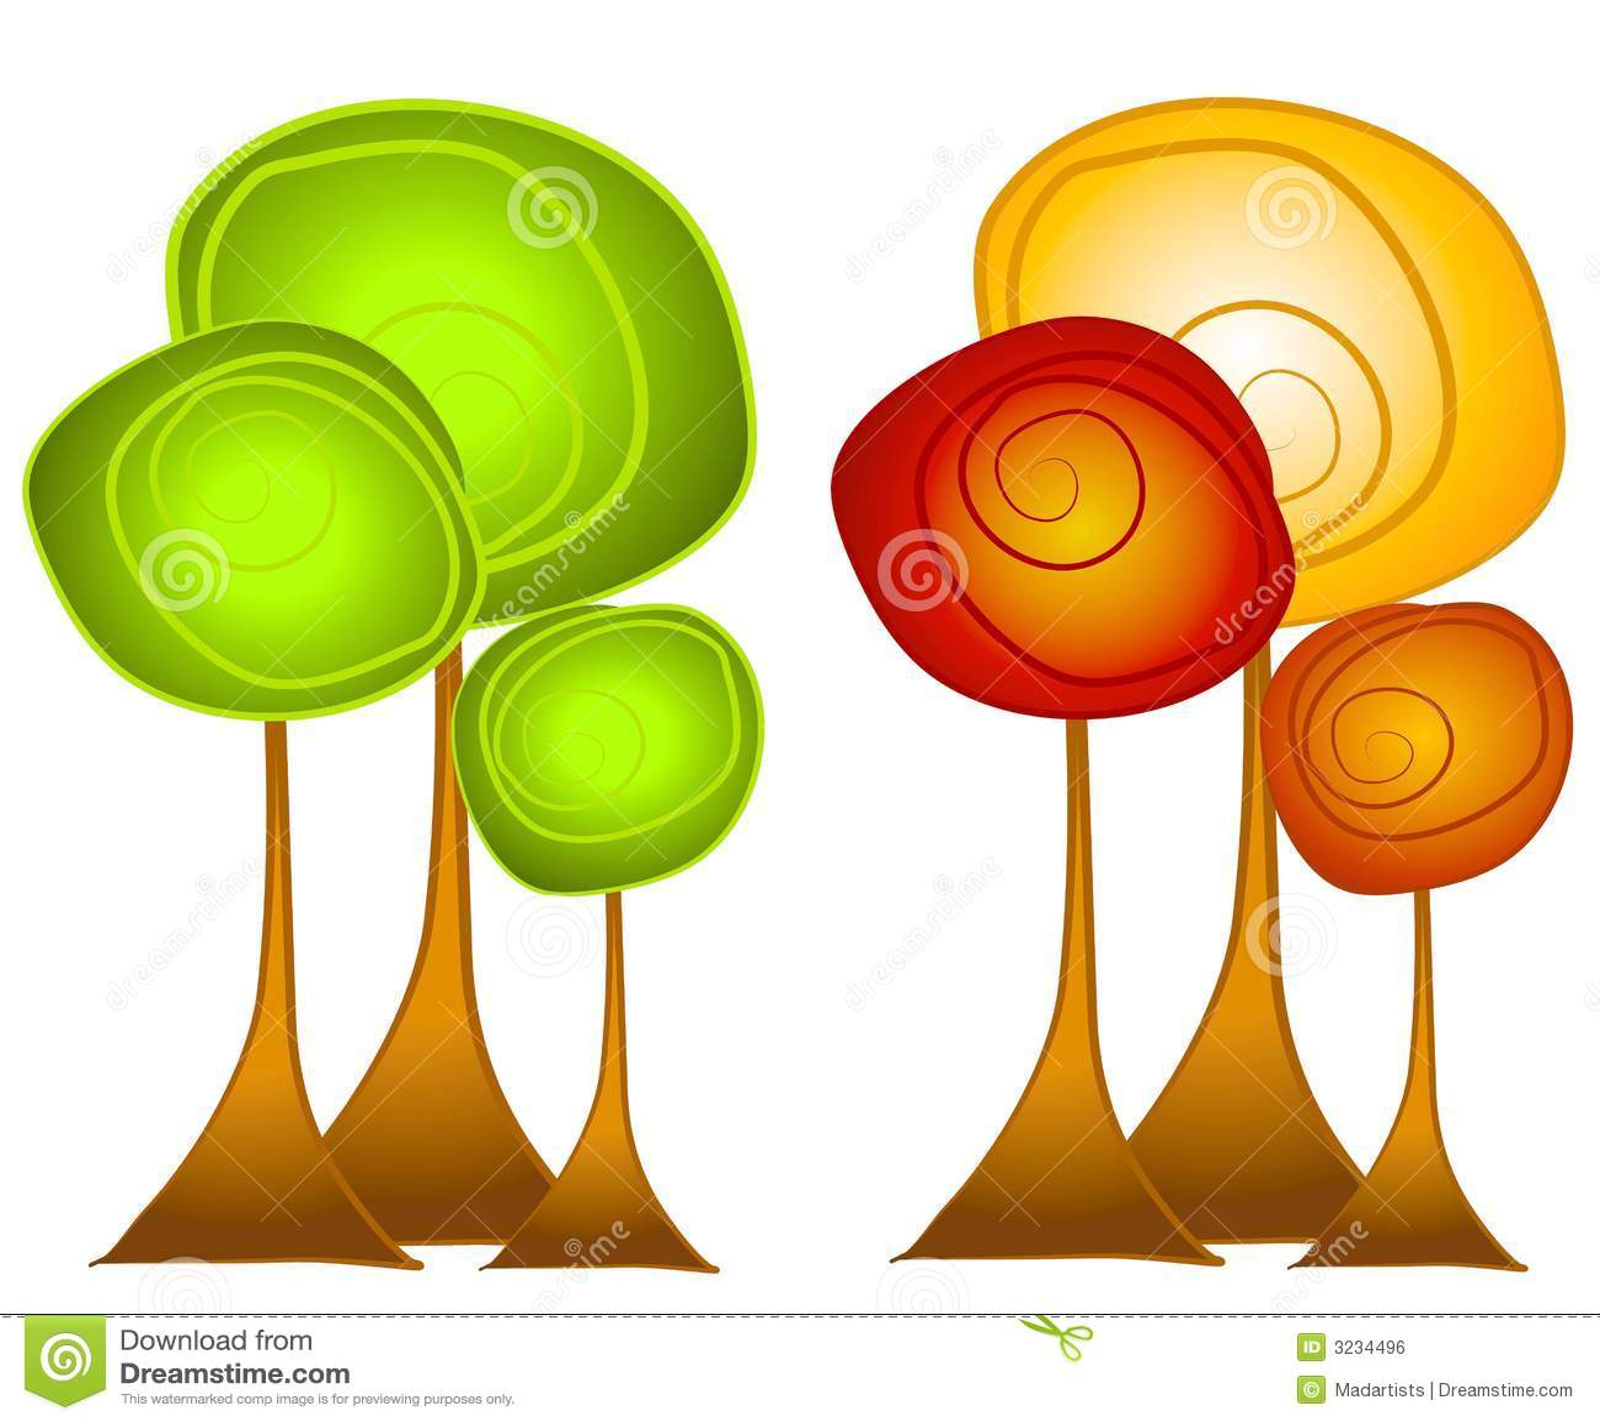 Fall And Summer Trees Clip Art Stock Illustration ...